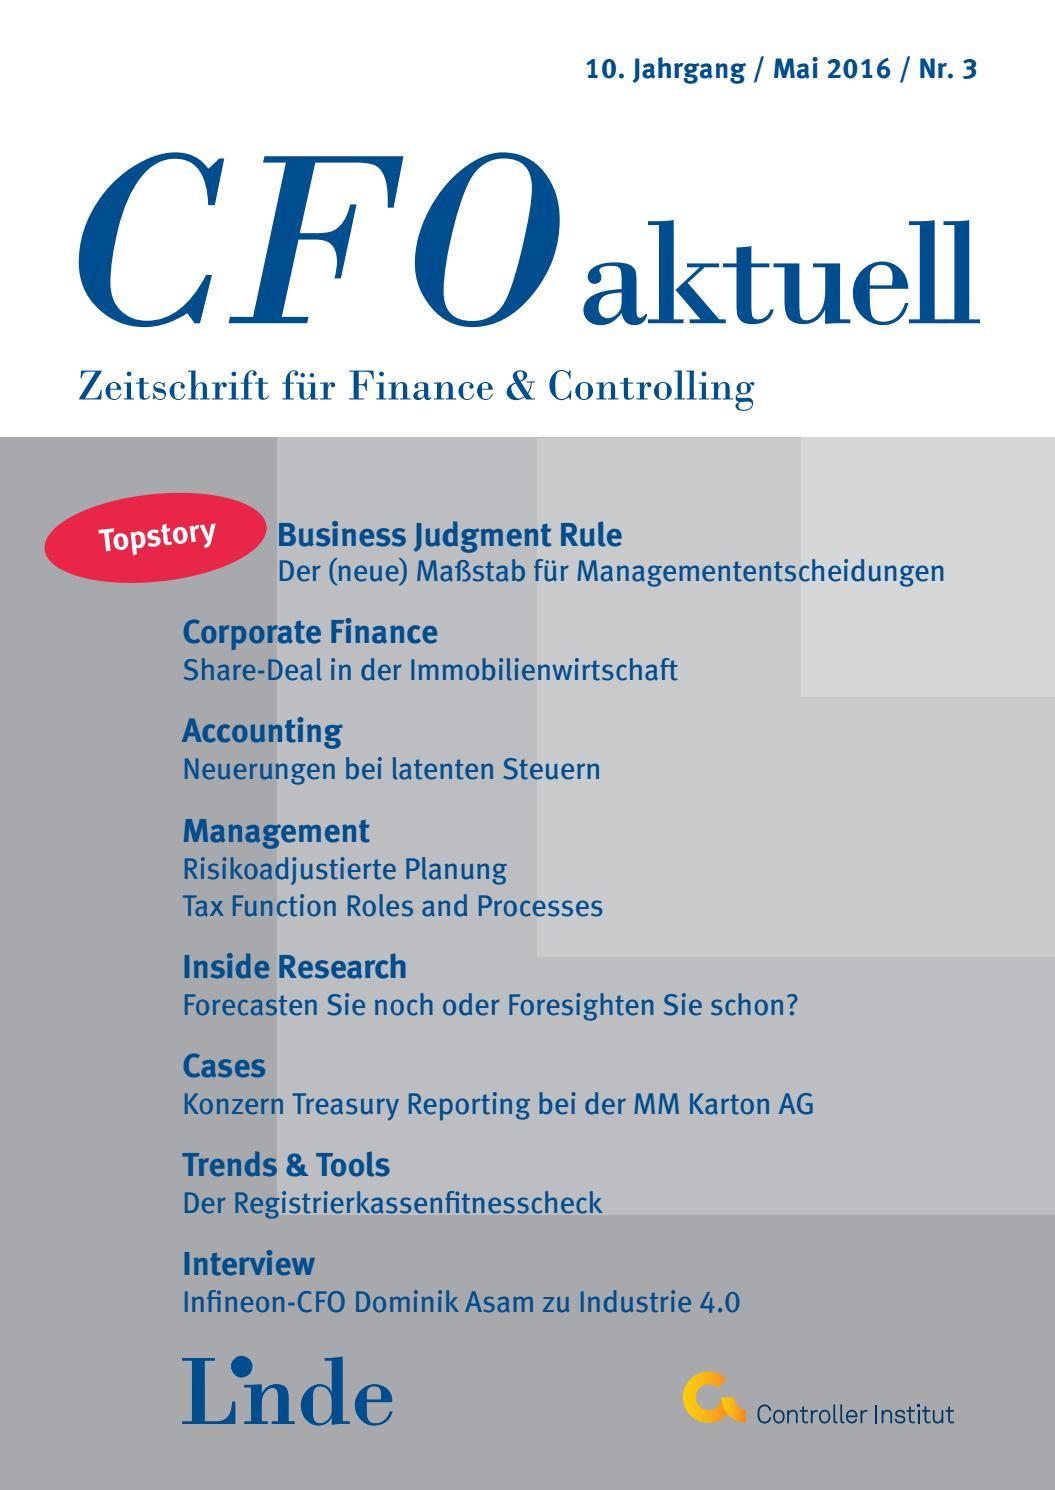 CFO aktuell - Heft 3/2016 by Linde Verlag GmbH - issuu